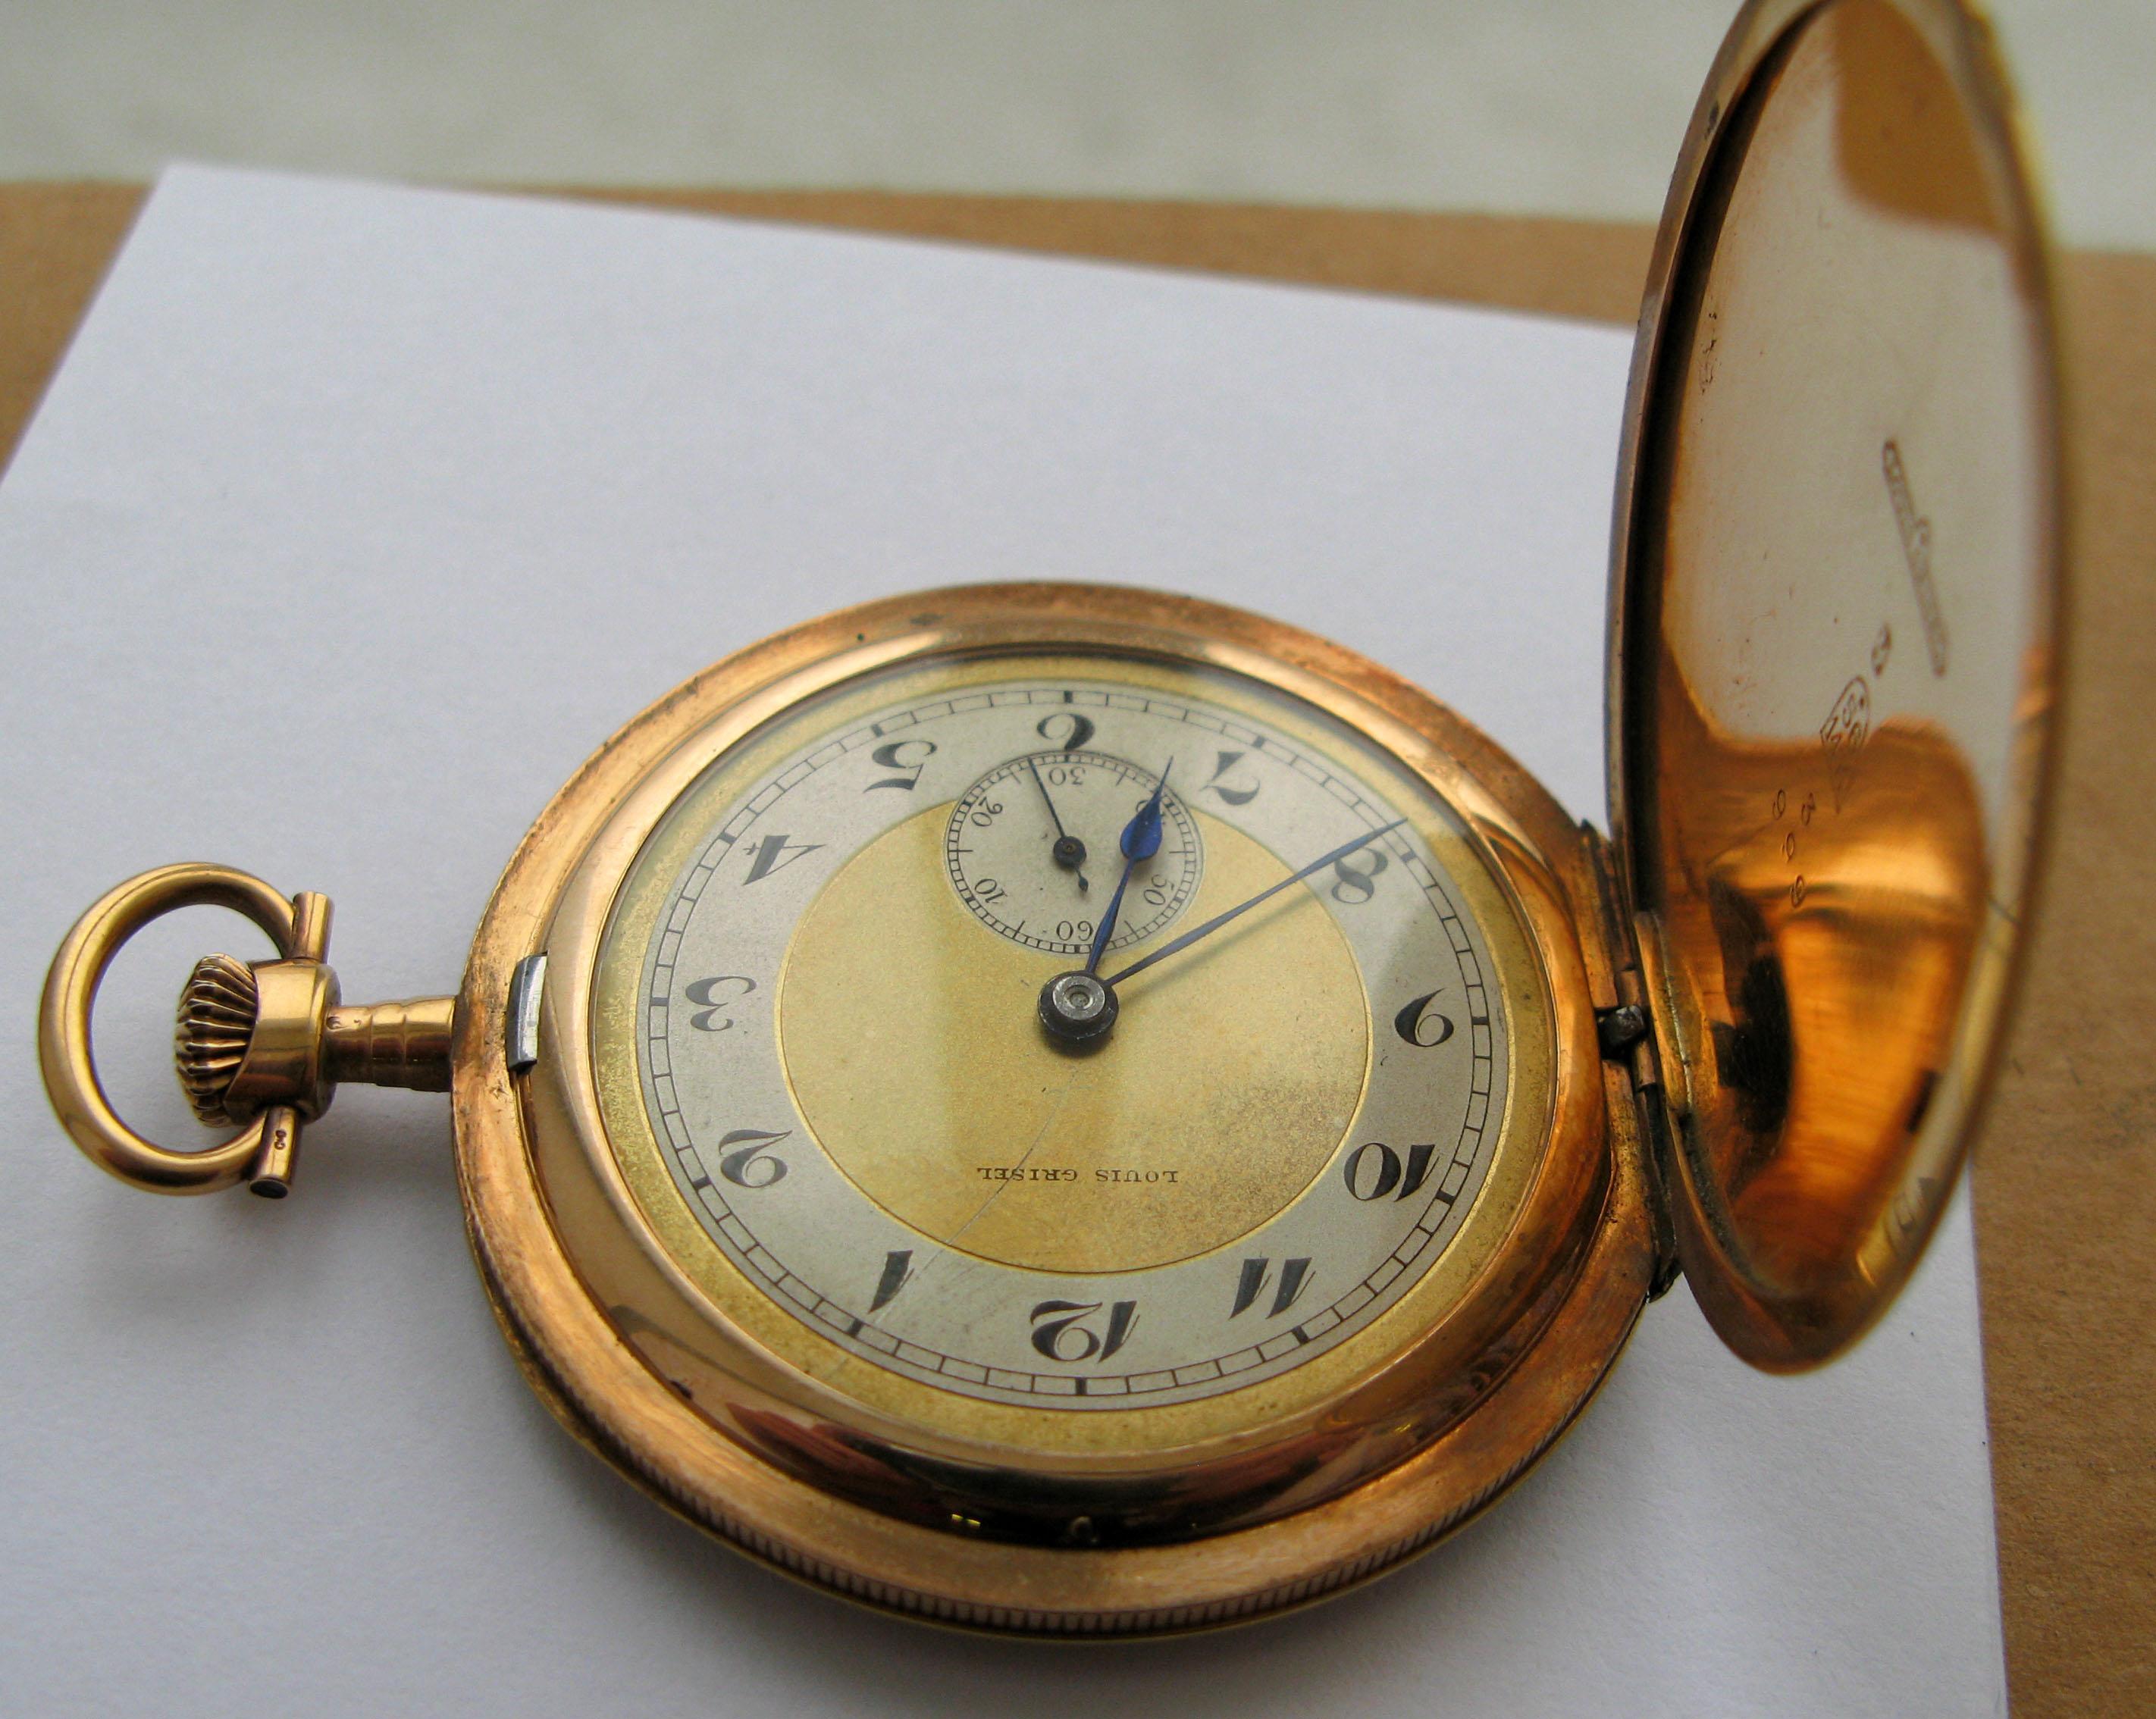 Золотые часы Louis Grisel - forumkladoiskatelru